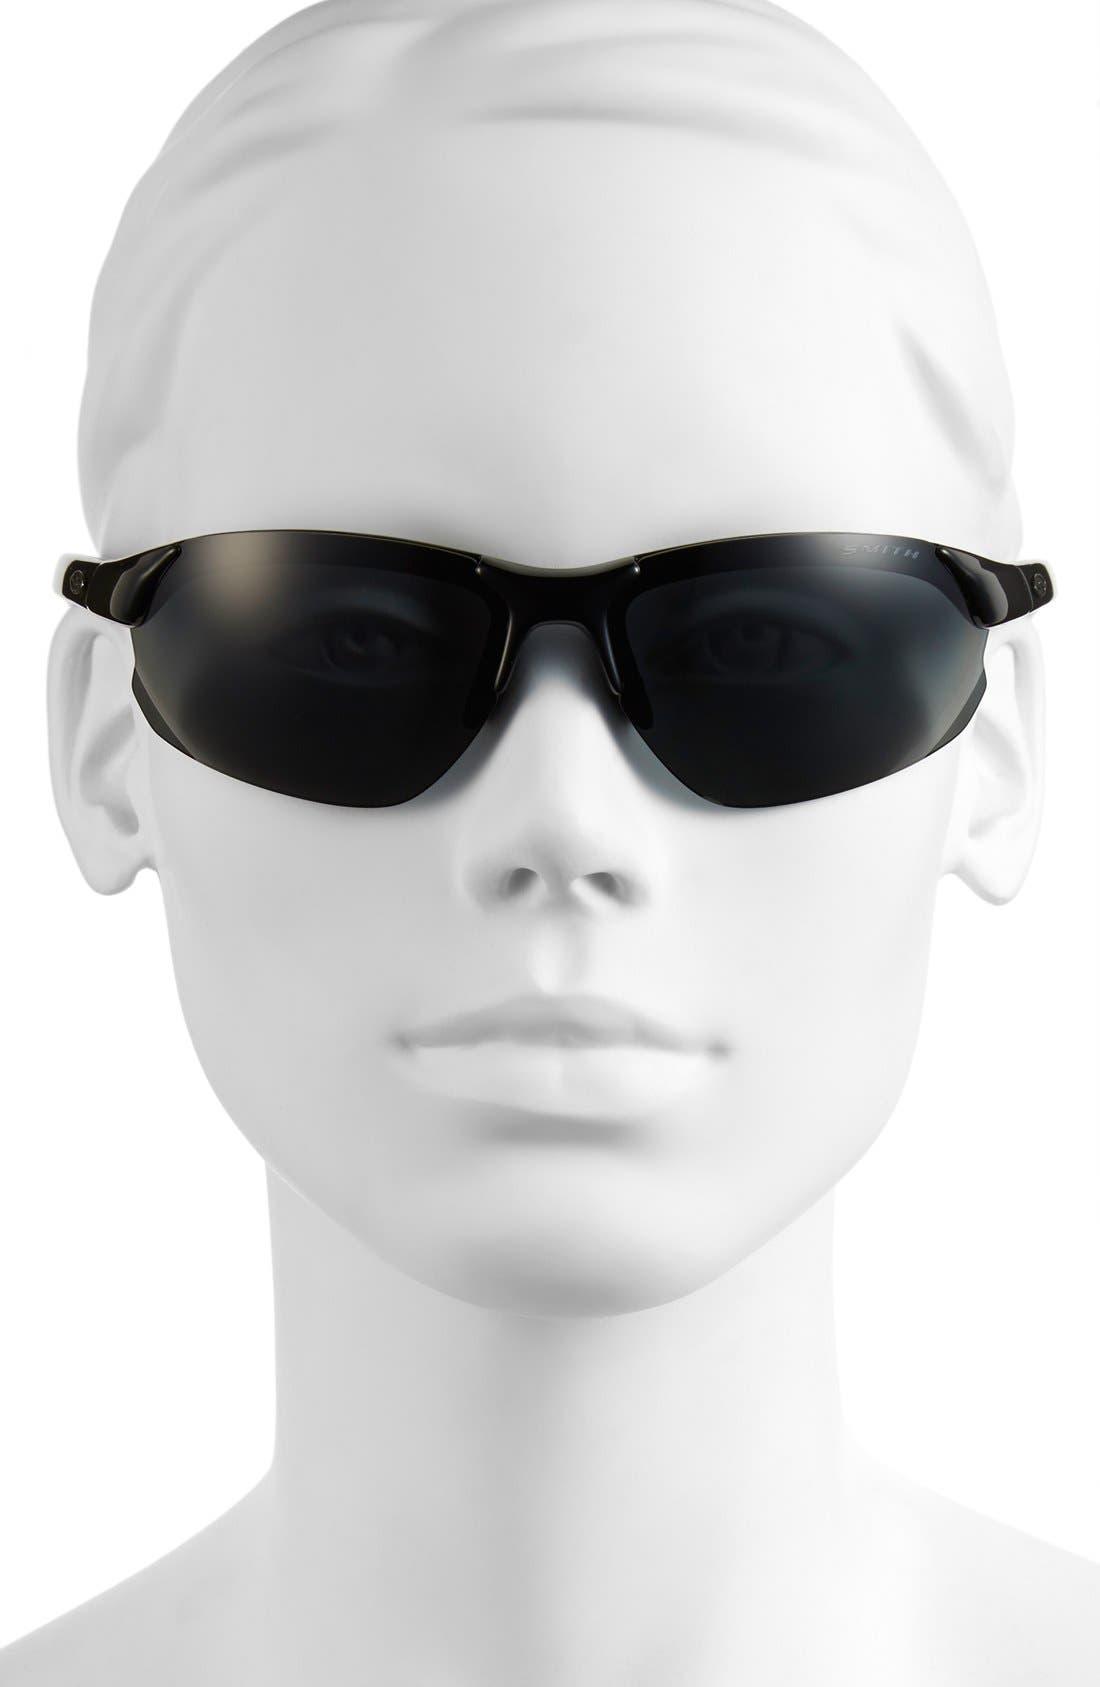 'Parallel DMax' 65mm Polarized Sunglasses,                             Alternate thumbnail 2, color,                             Black/ Polar Grey/ Clear